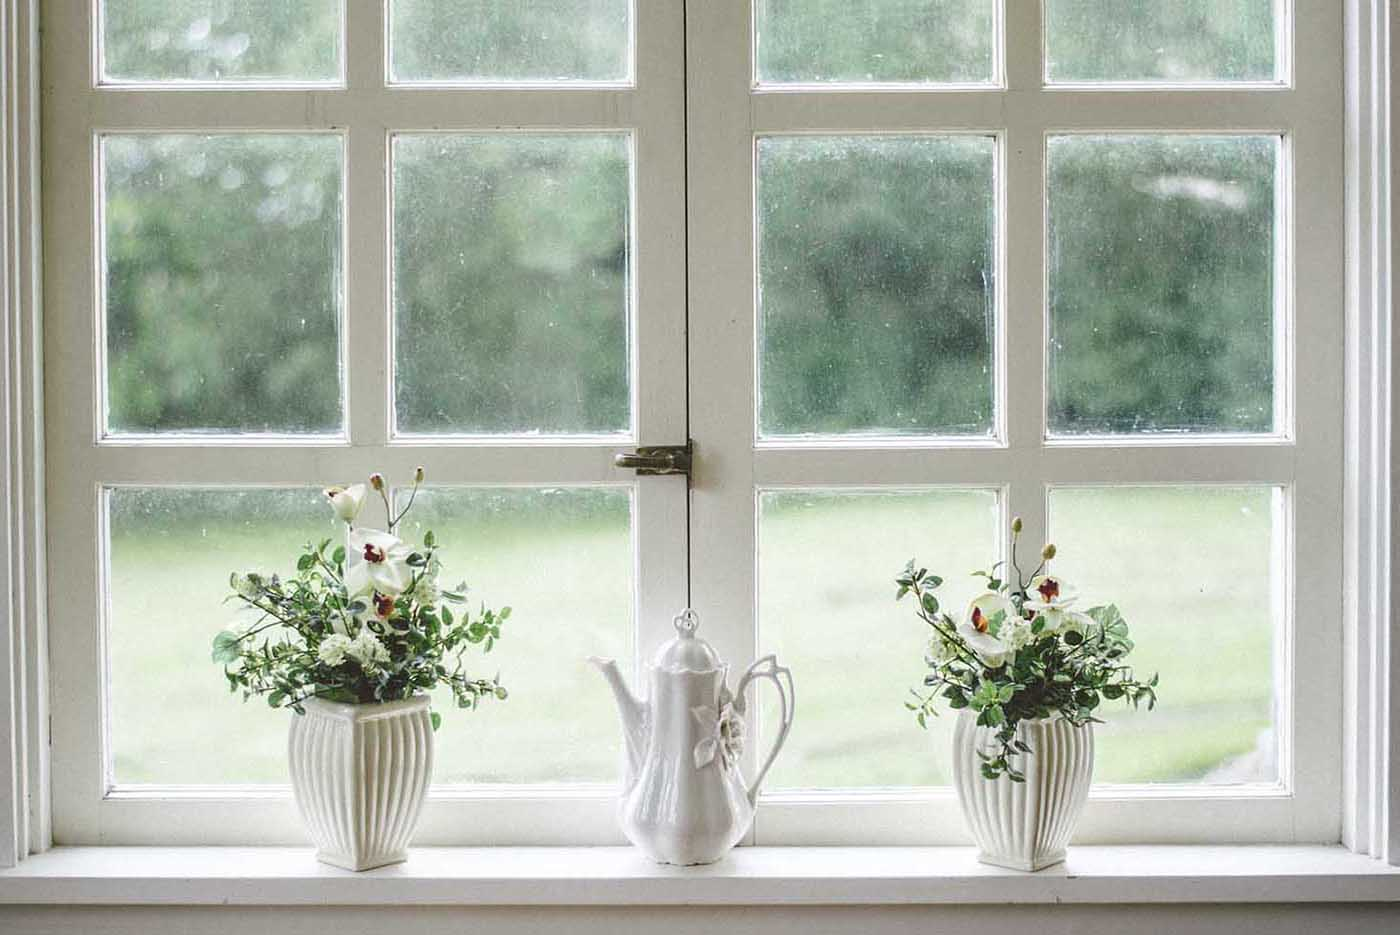 8 Окна пластиковые | Окна 911 | Окна 911